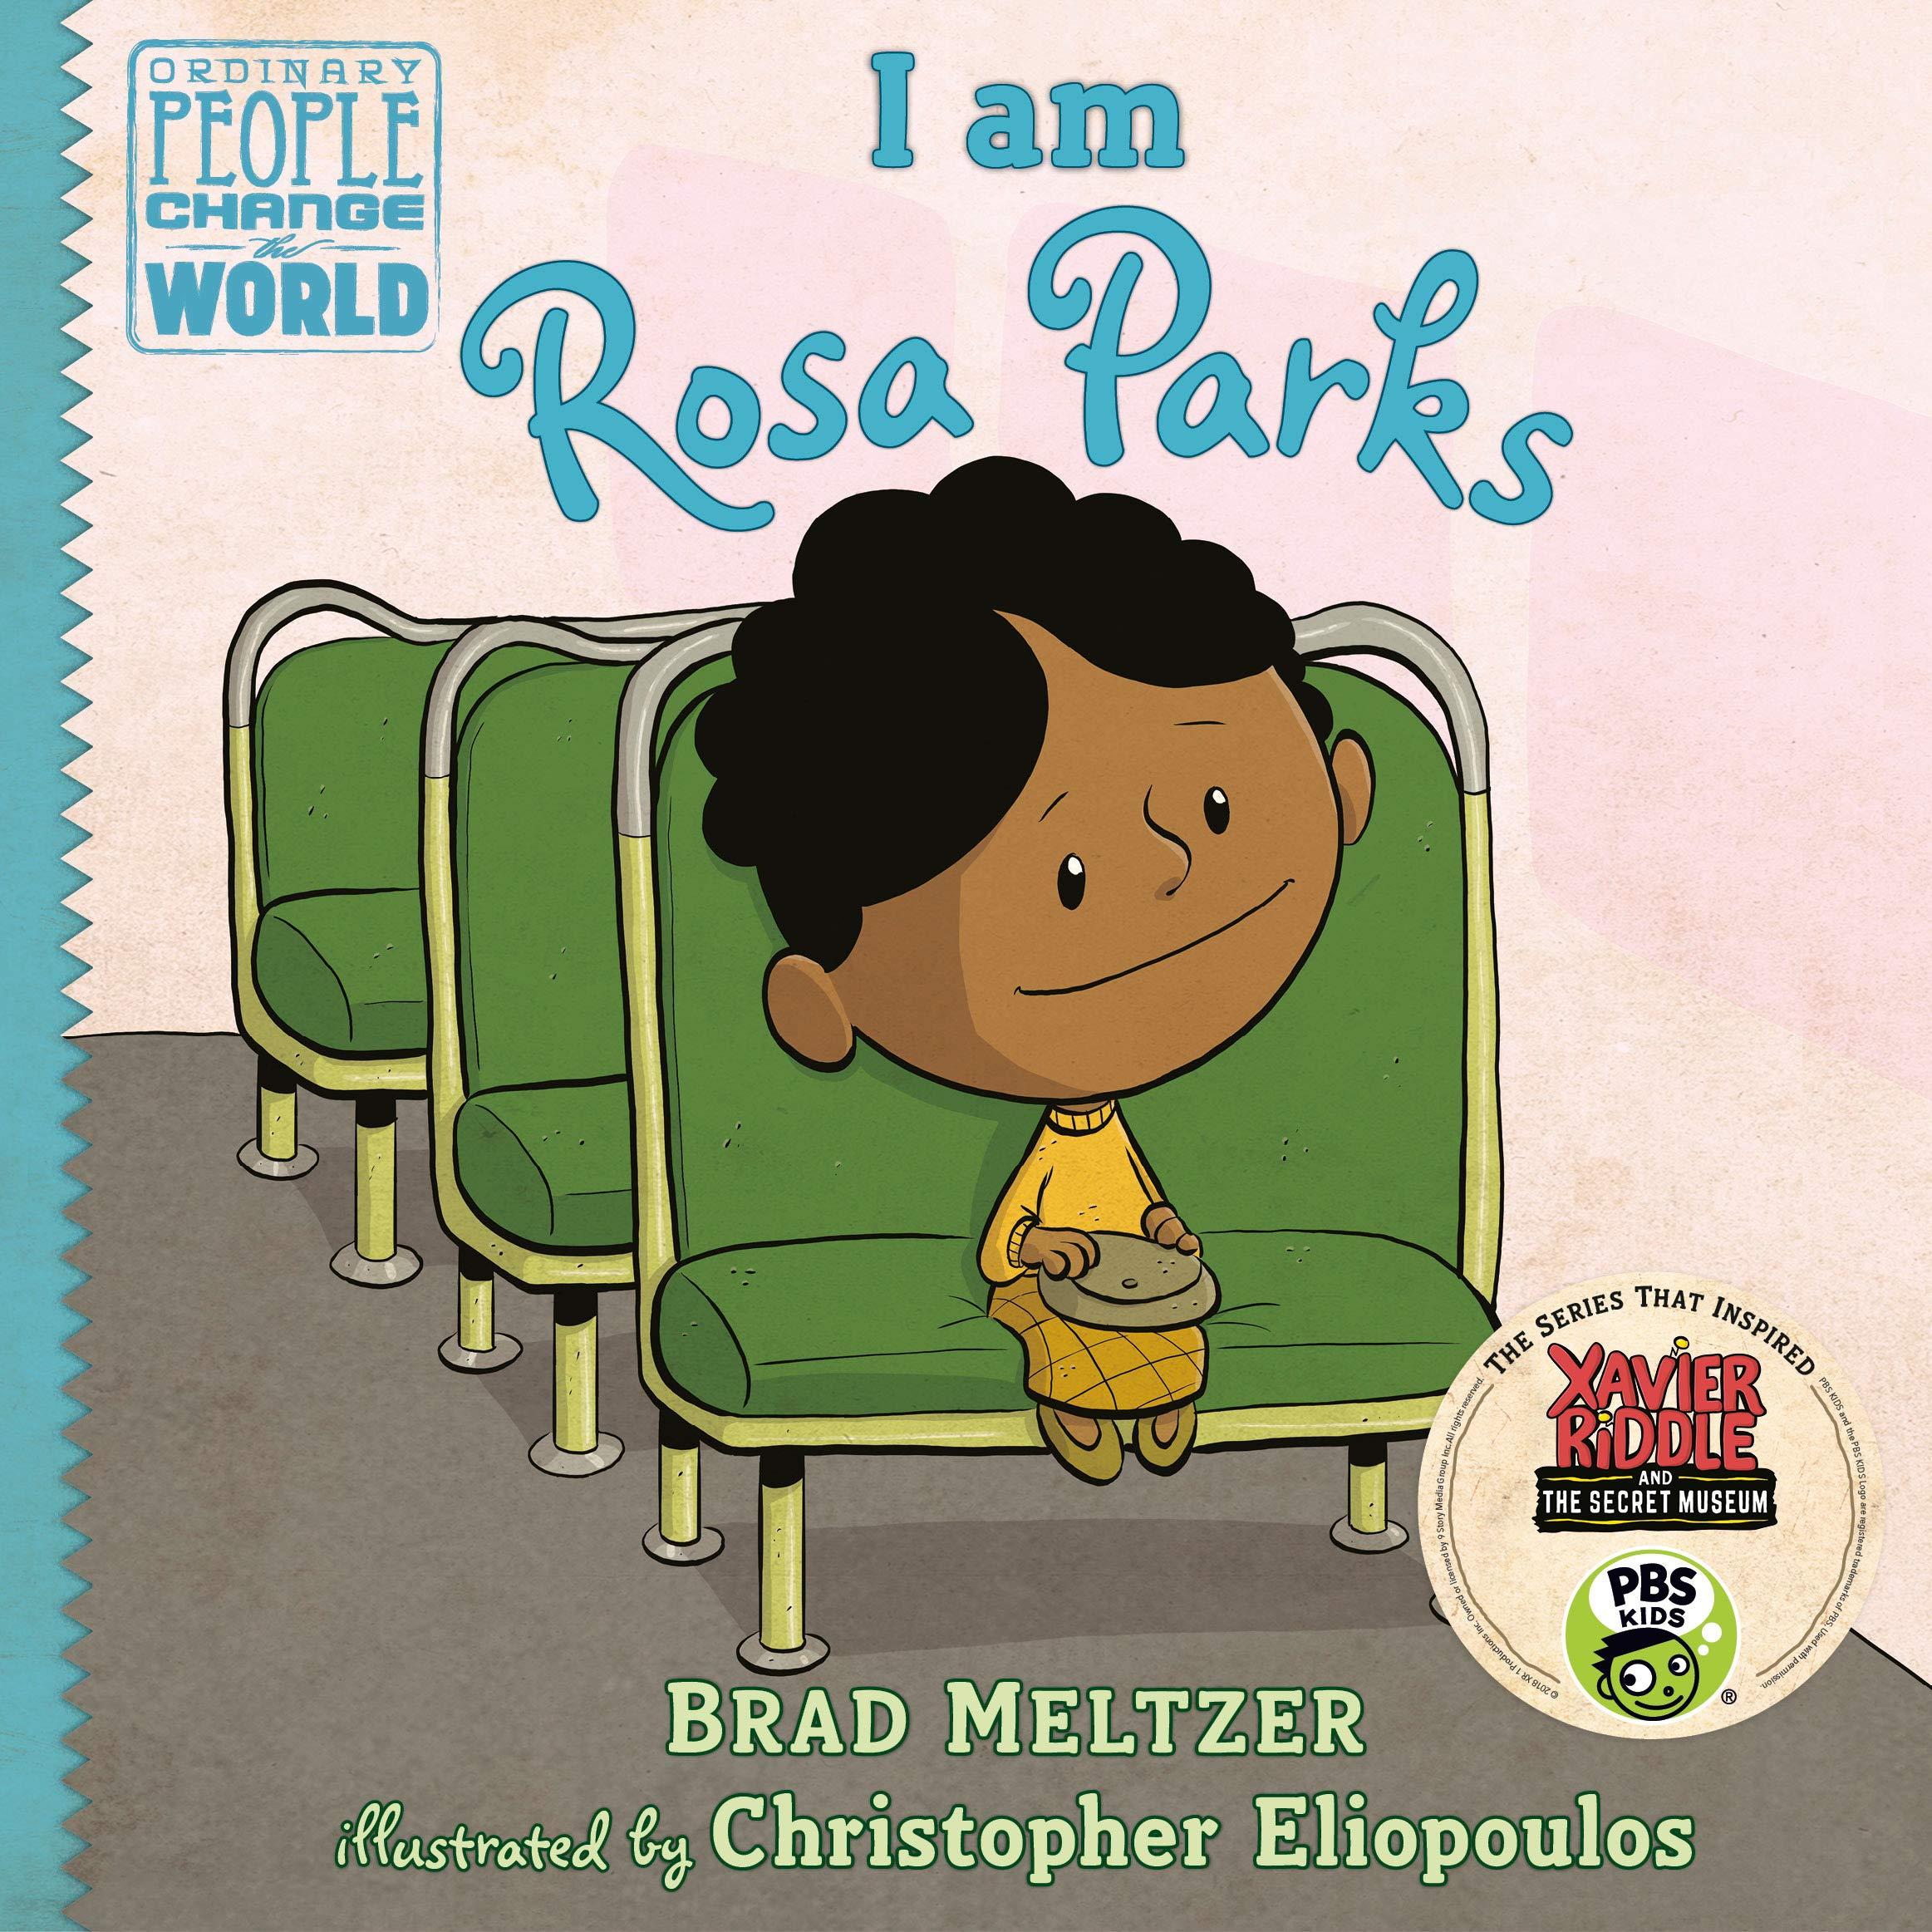 I am Rosa Parks (Ordinary People Change/World)